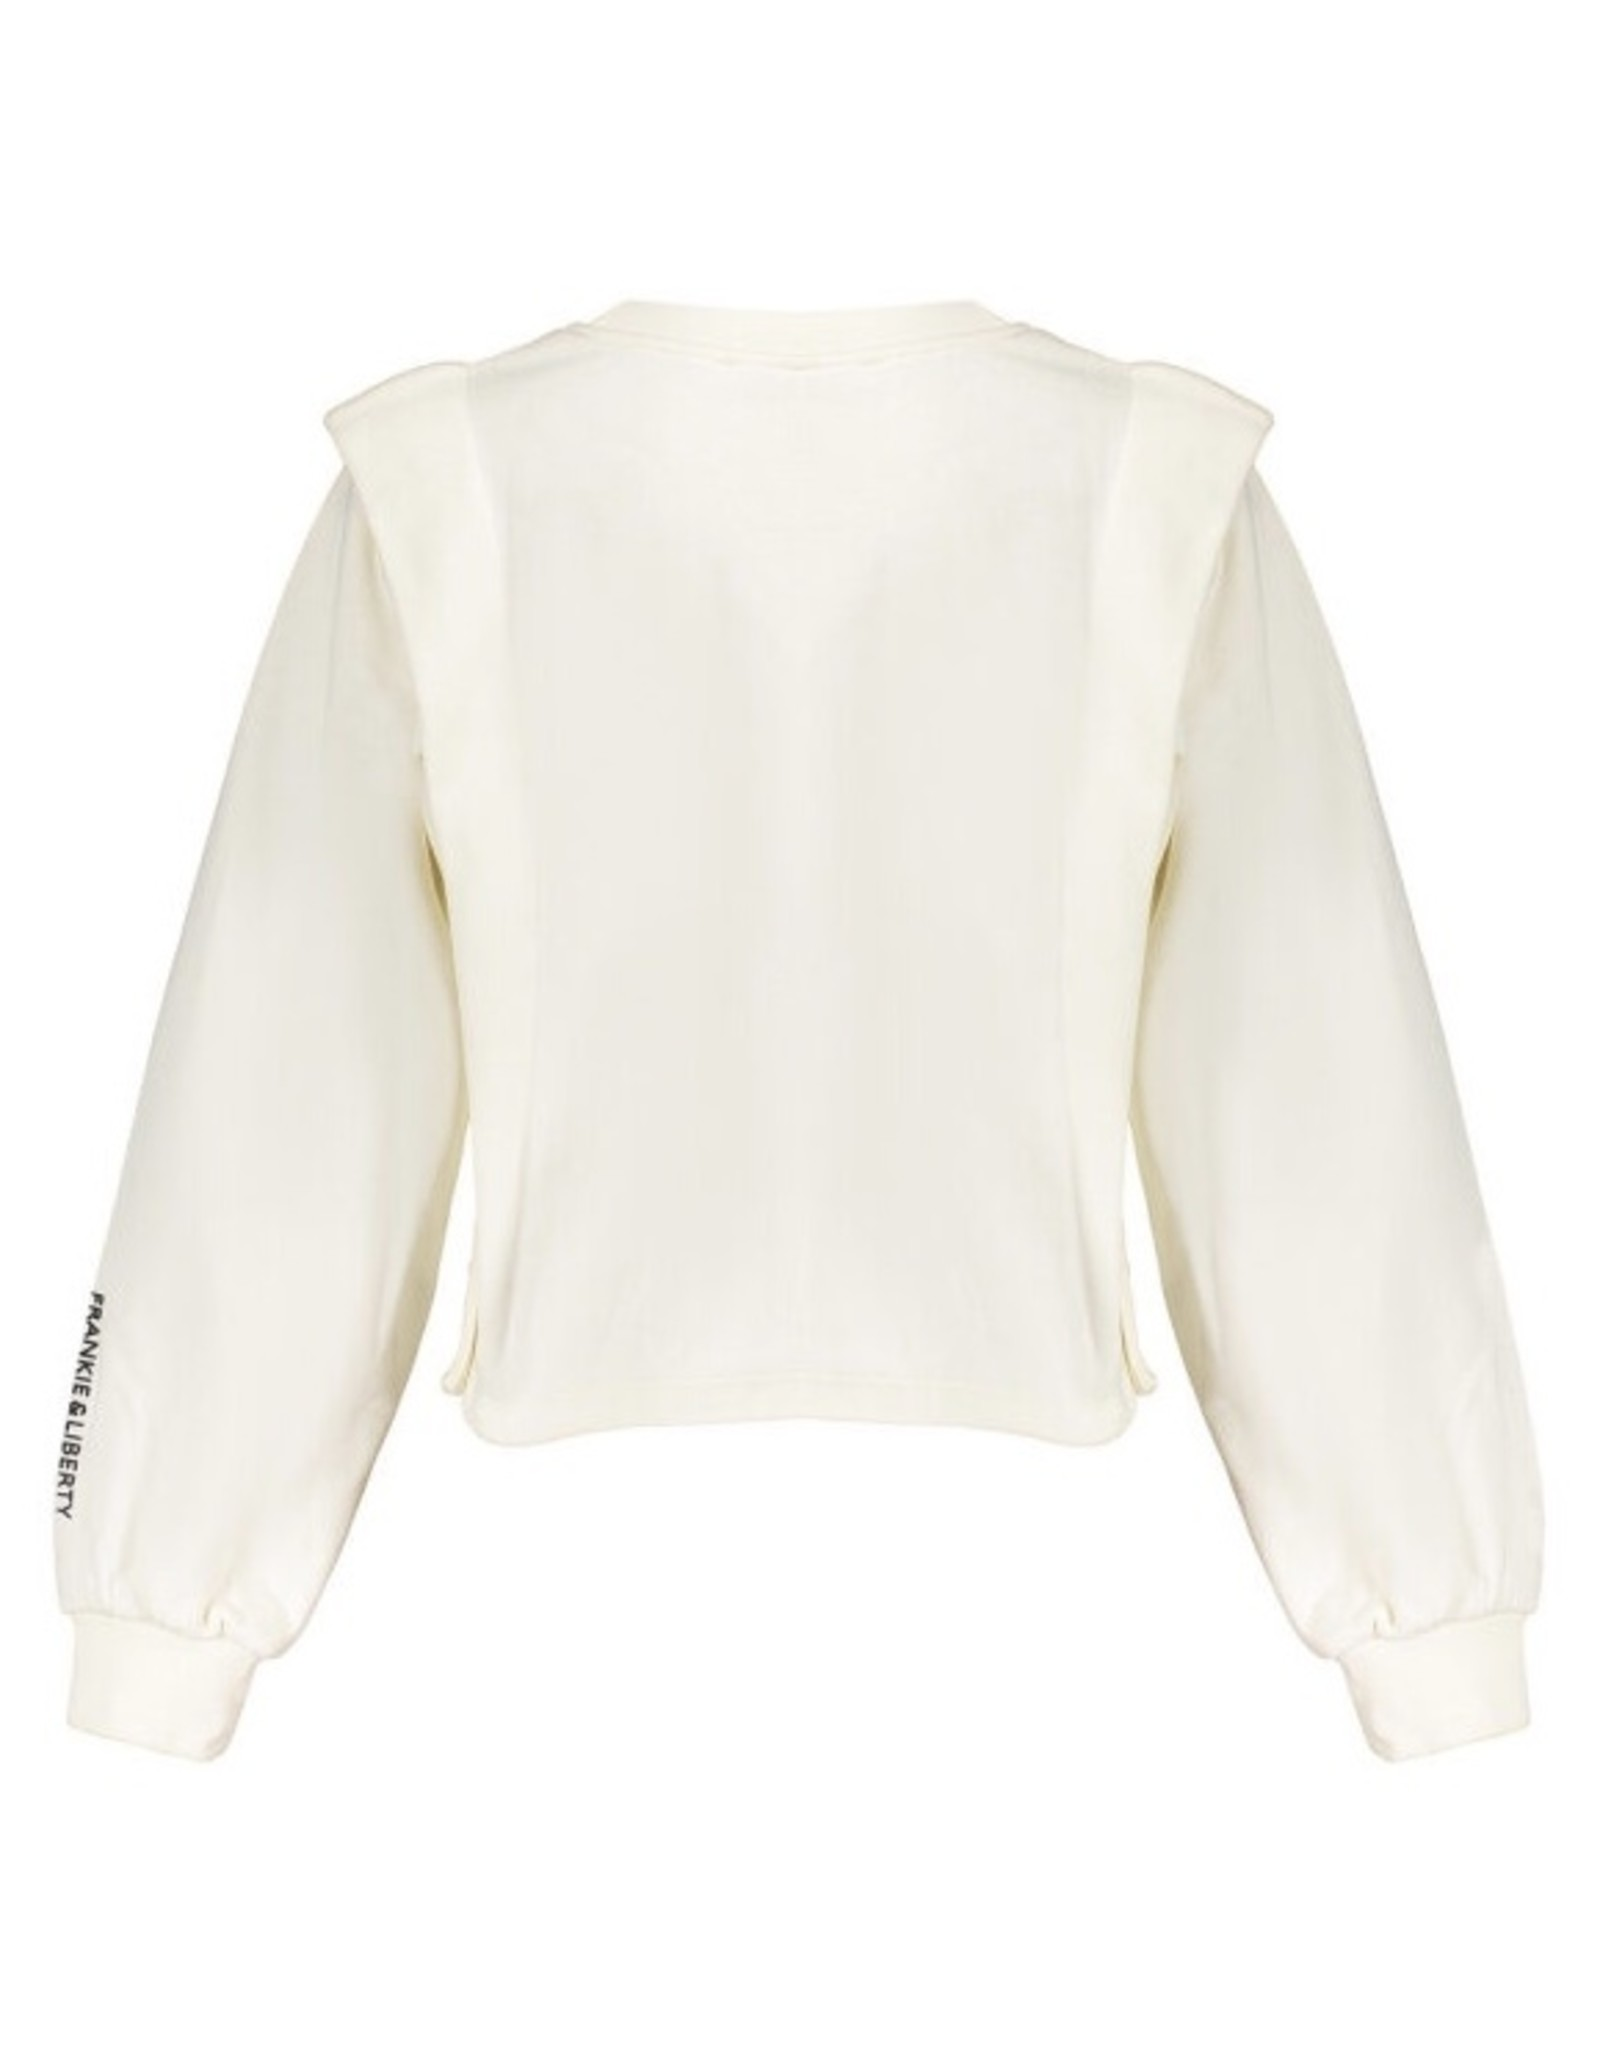 Frankie & Liberty Annet sweater